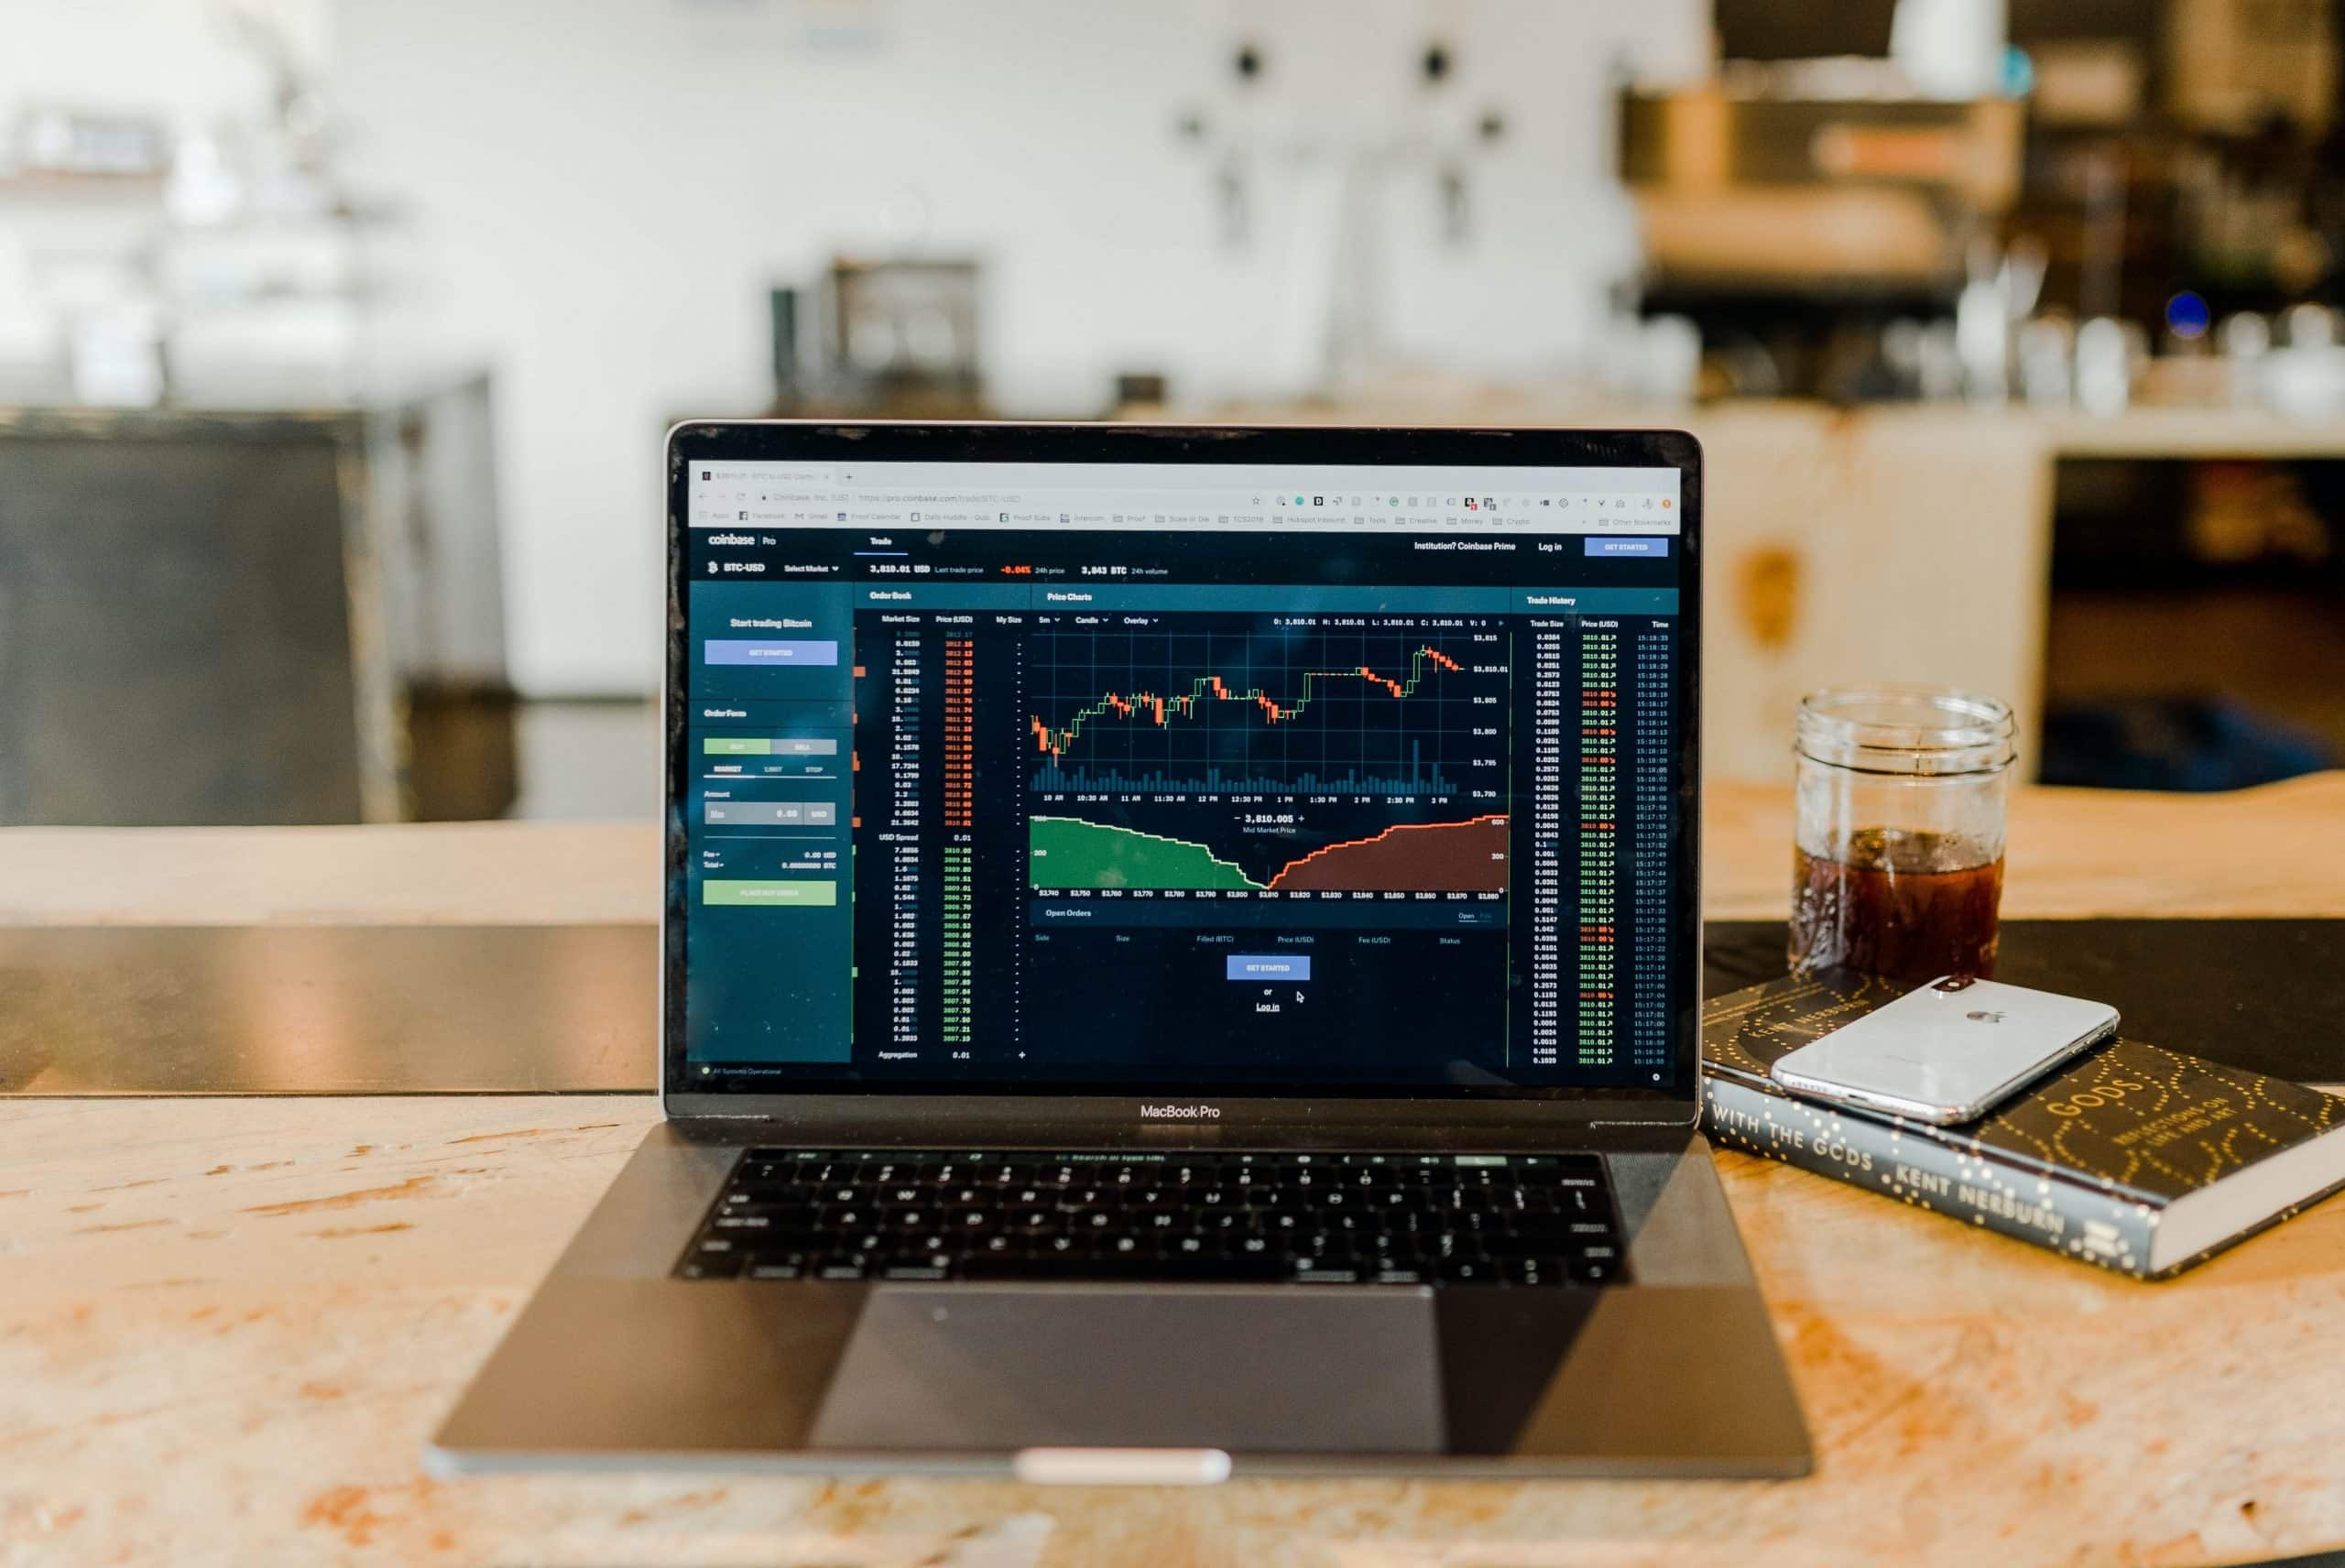 Best litecoin trading startegies